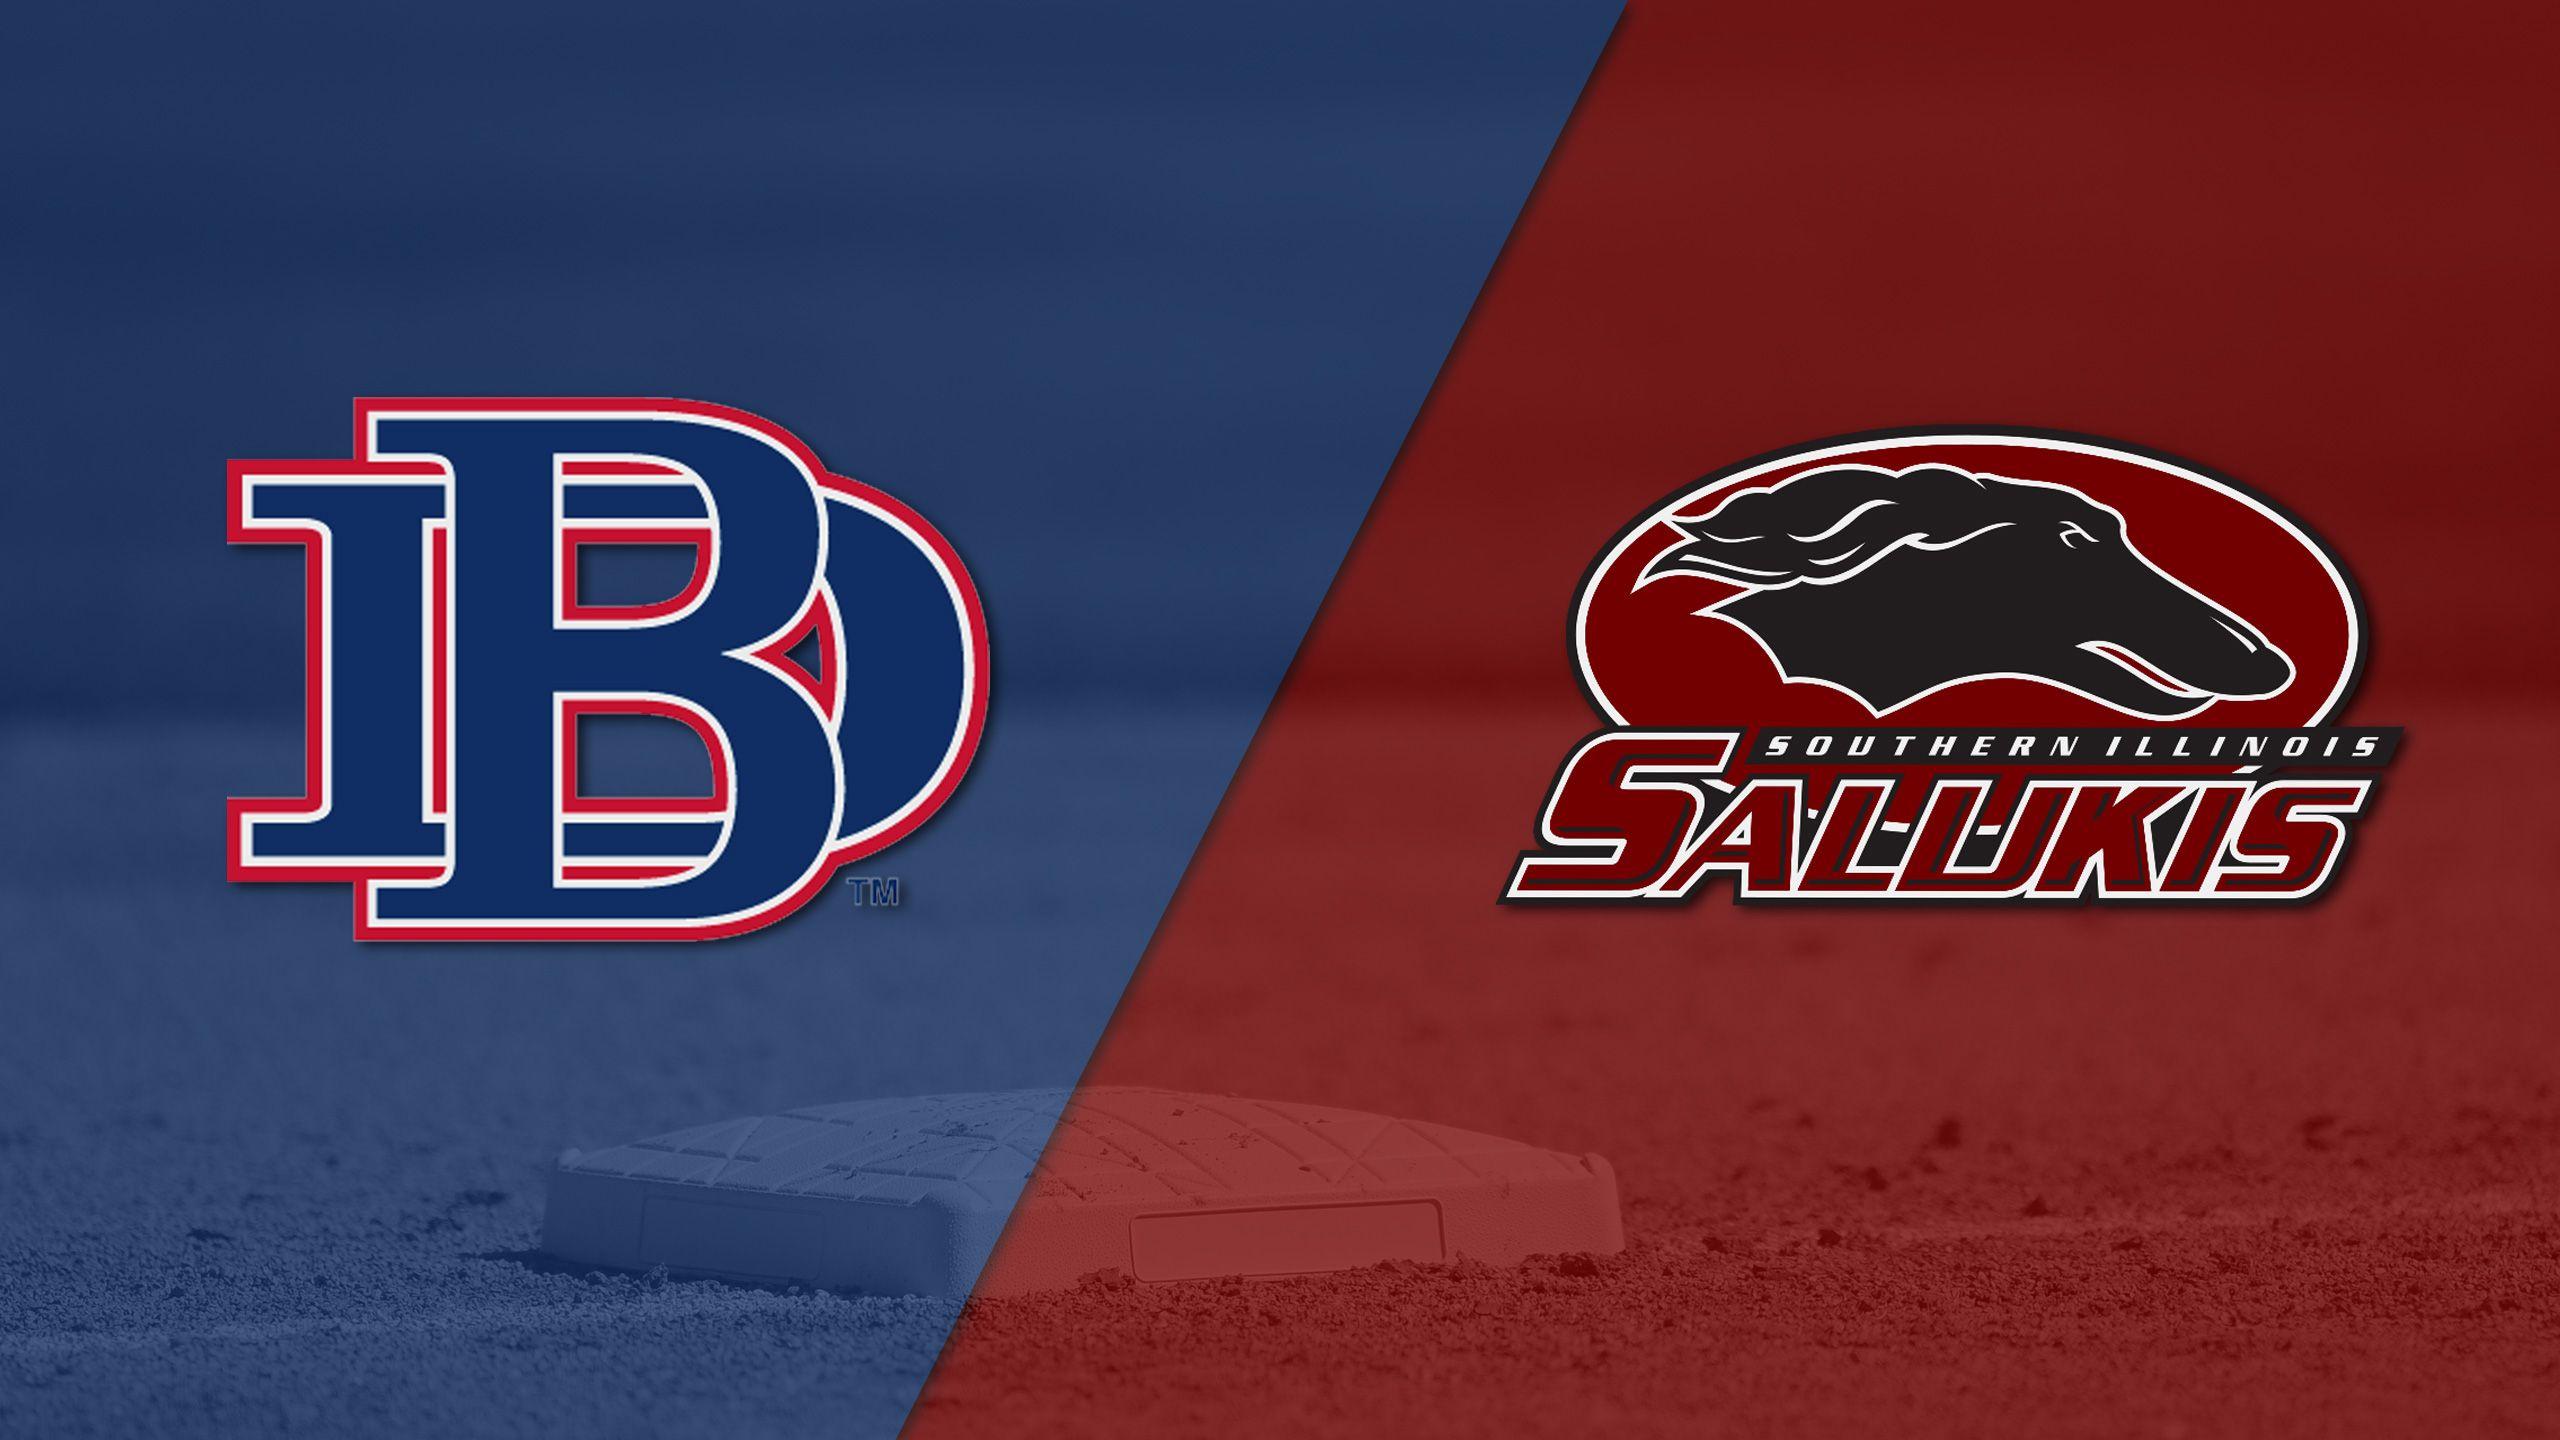 Dallas Baptist vs. Southern Illinois (Baseball)